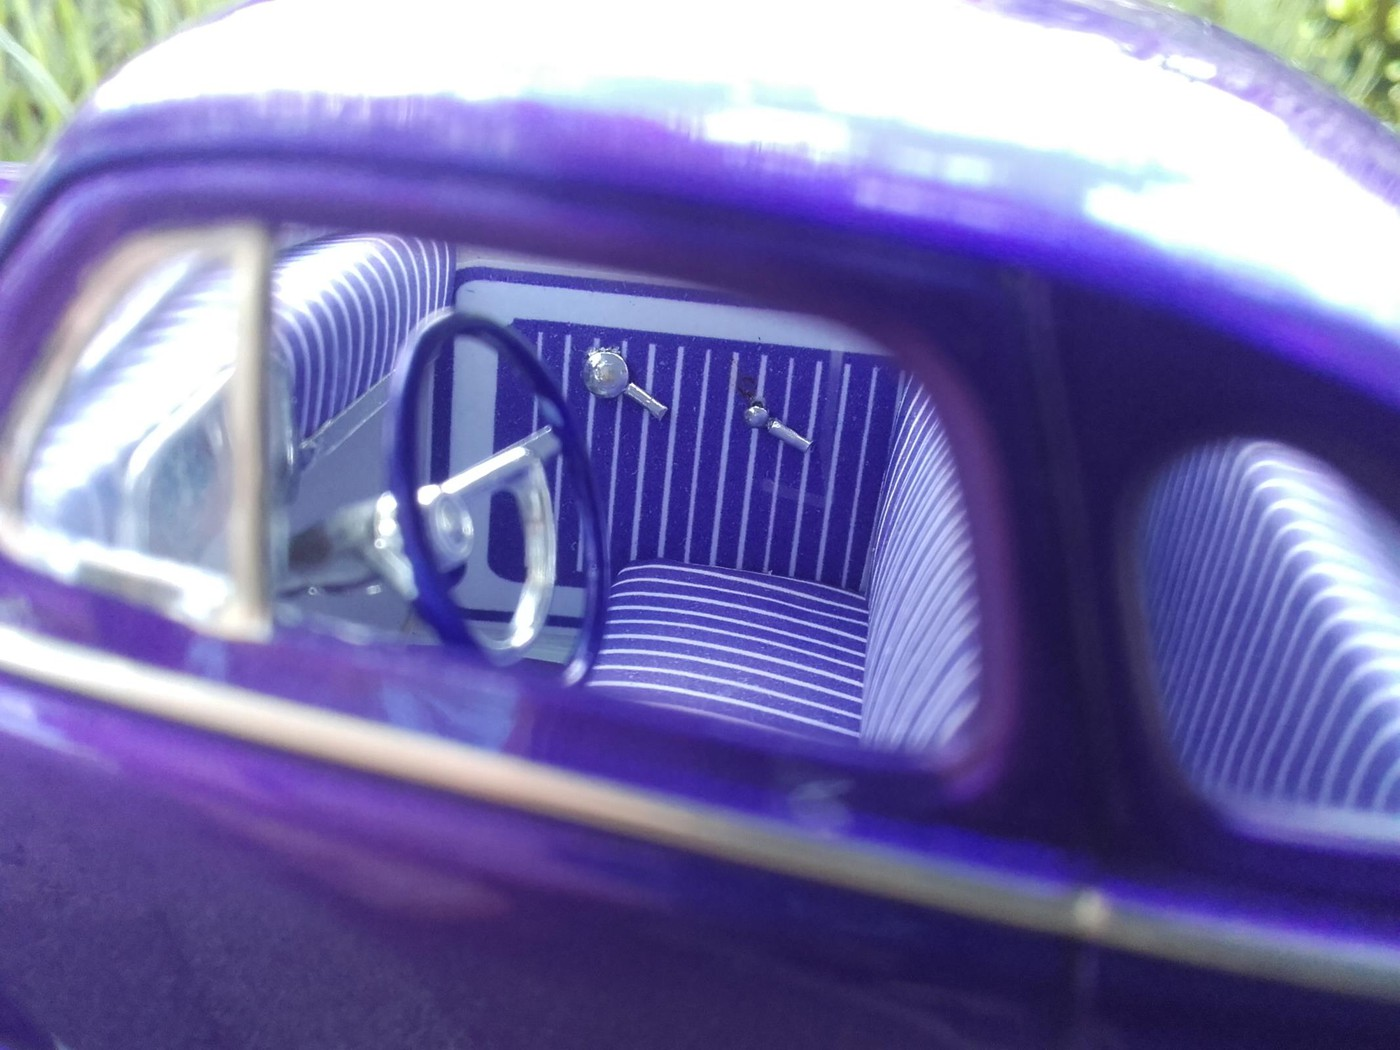 Projet Chevy 37 custom terminée  - Page 2 Photo29-vi